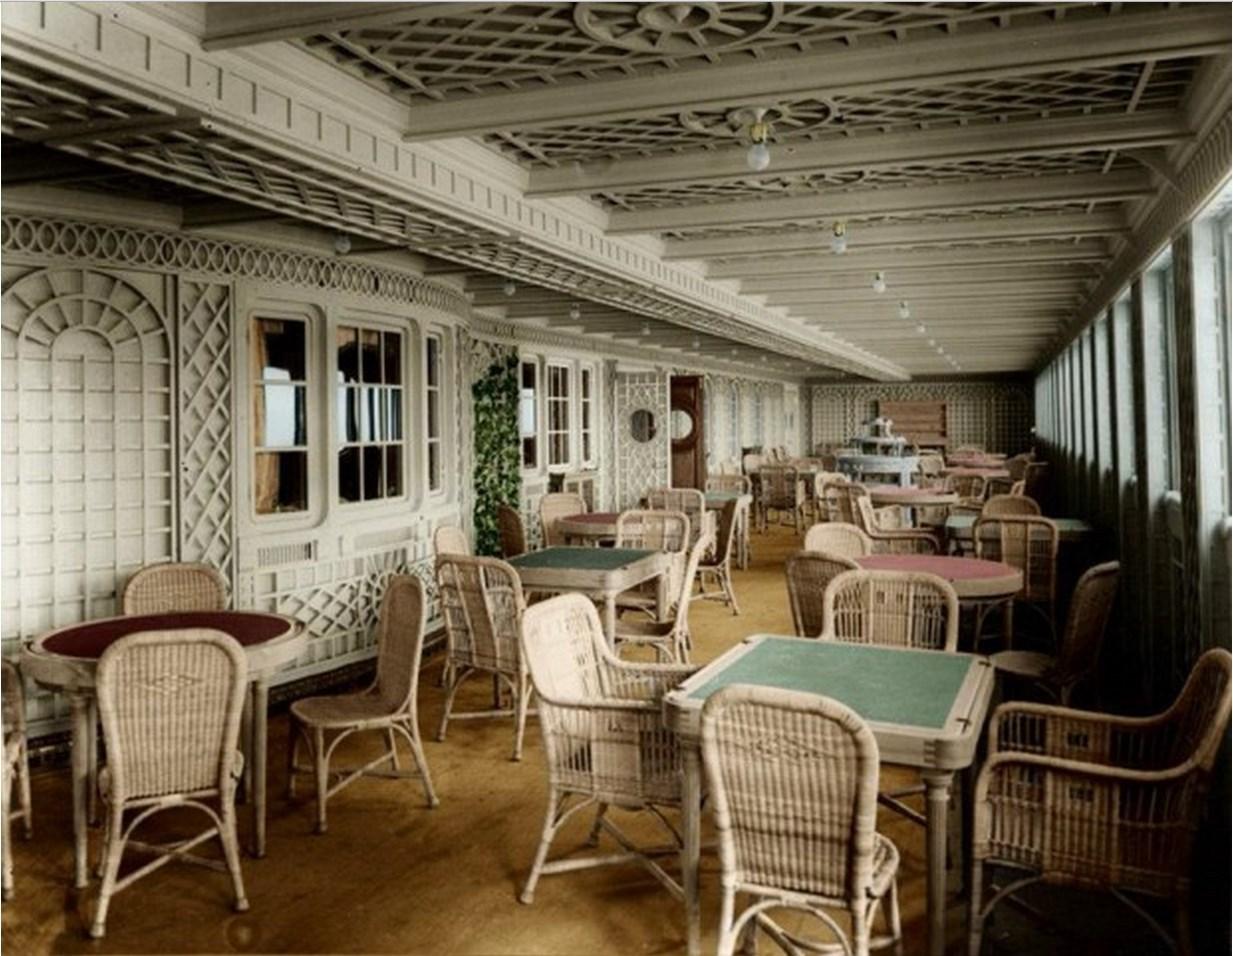 Titanic au 1/200 Trumpeter - Page 10 Images10